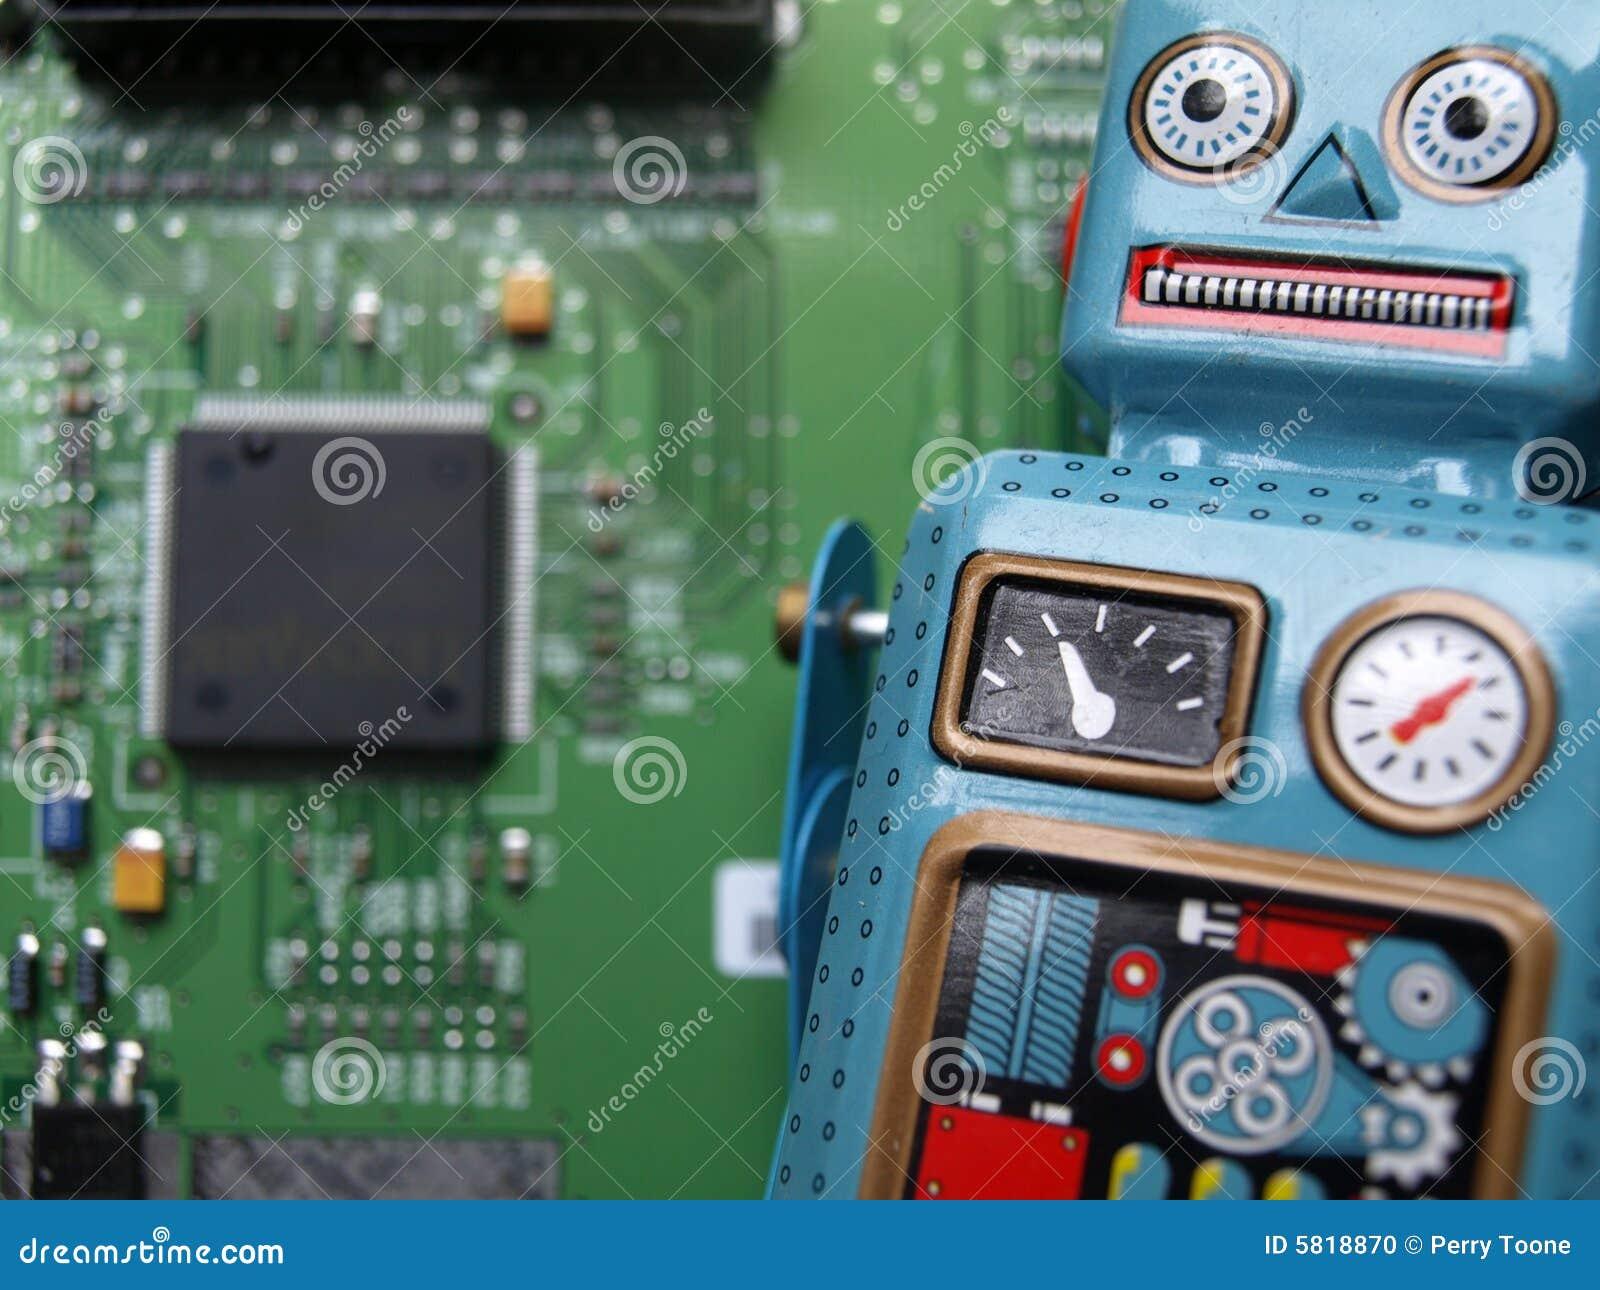 Circuito Aberto : Robô com circuito aberto foto de stock. imagem de cubo 5818870